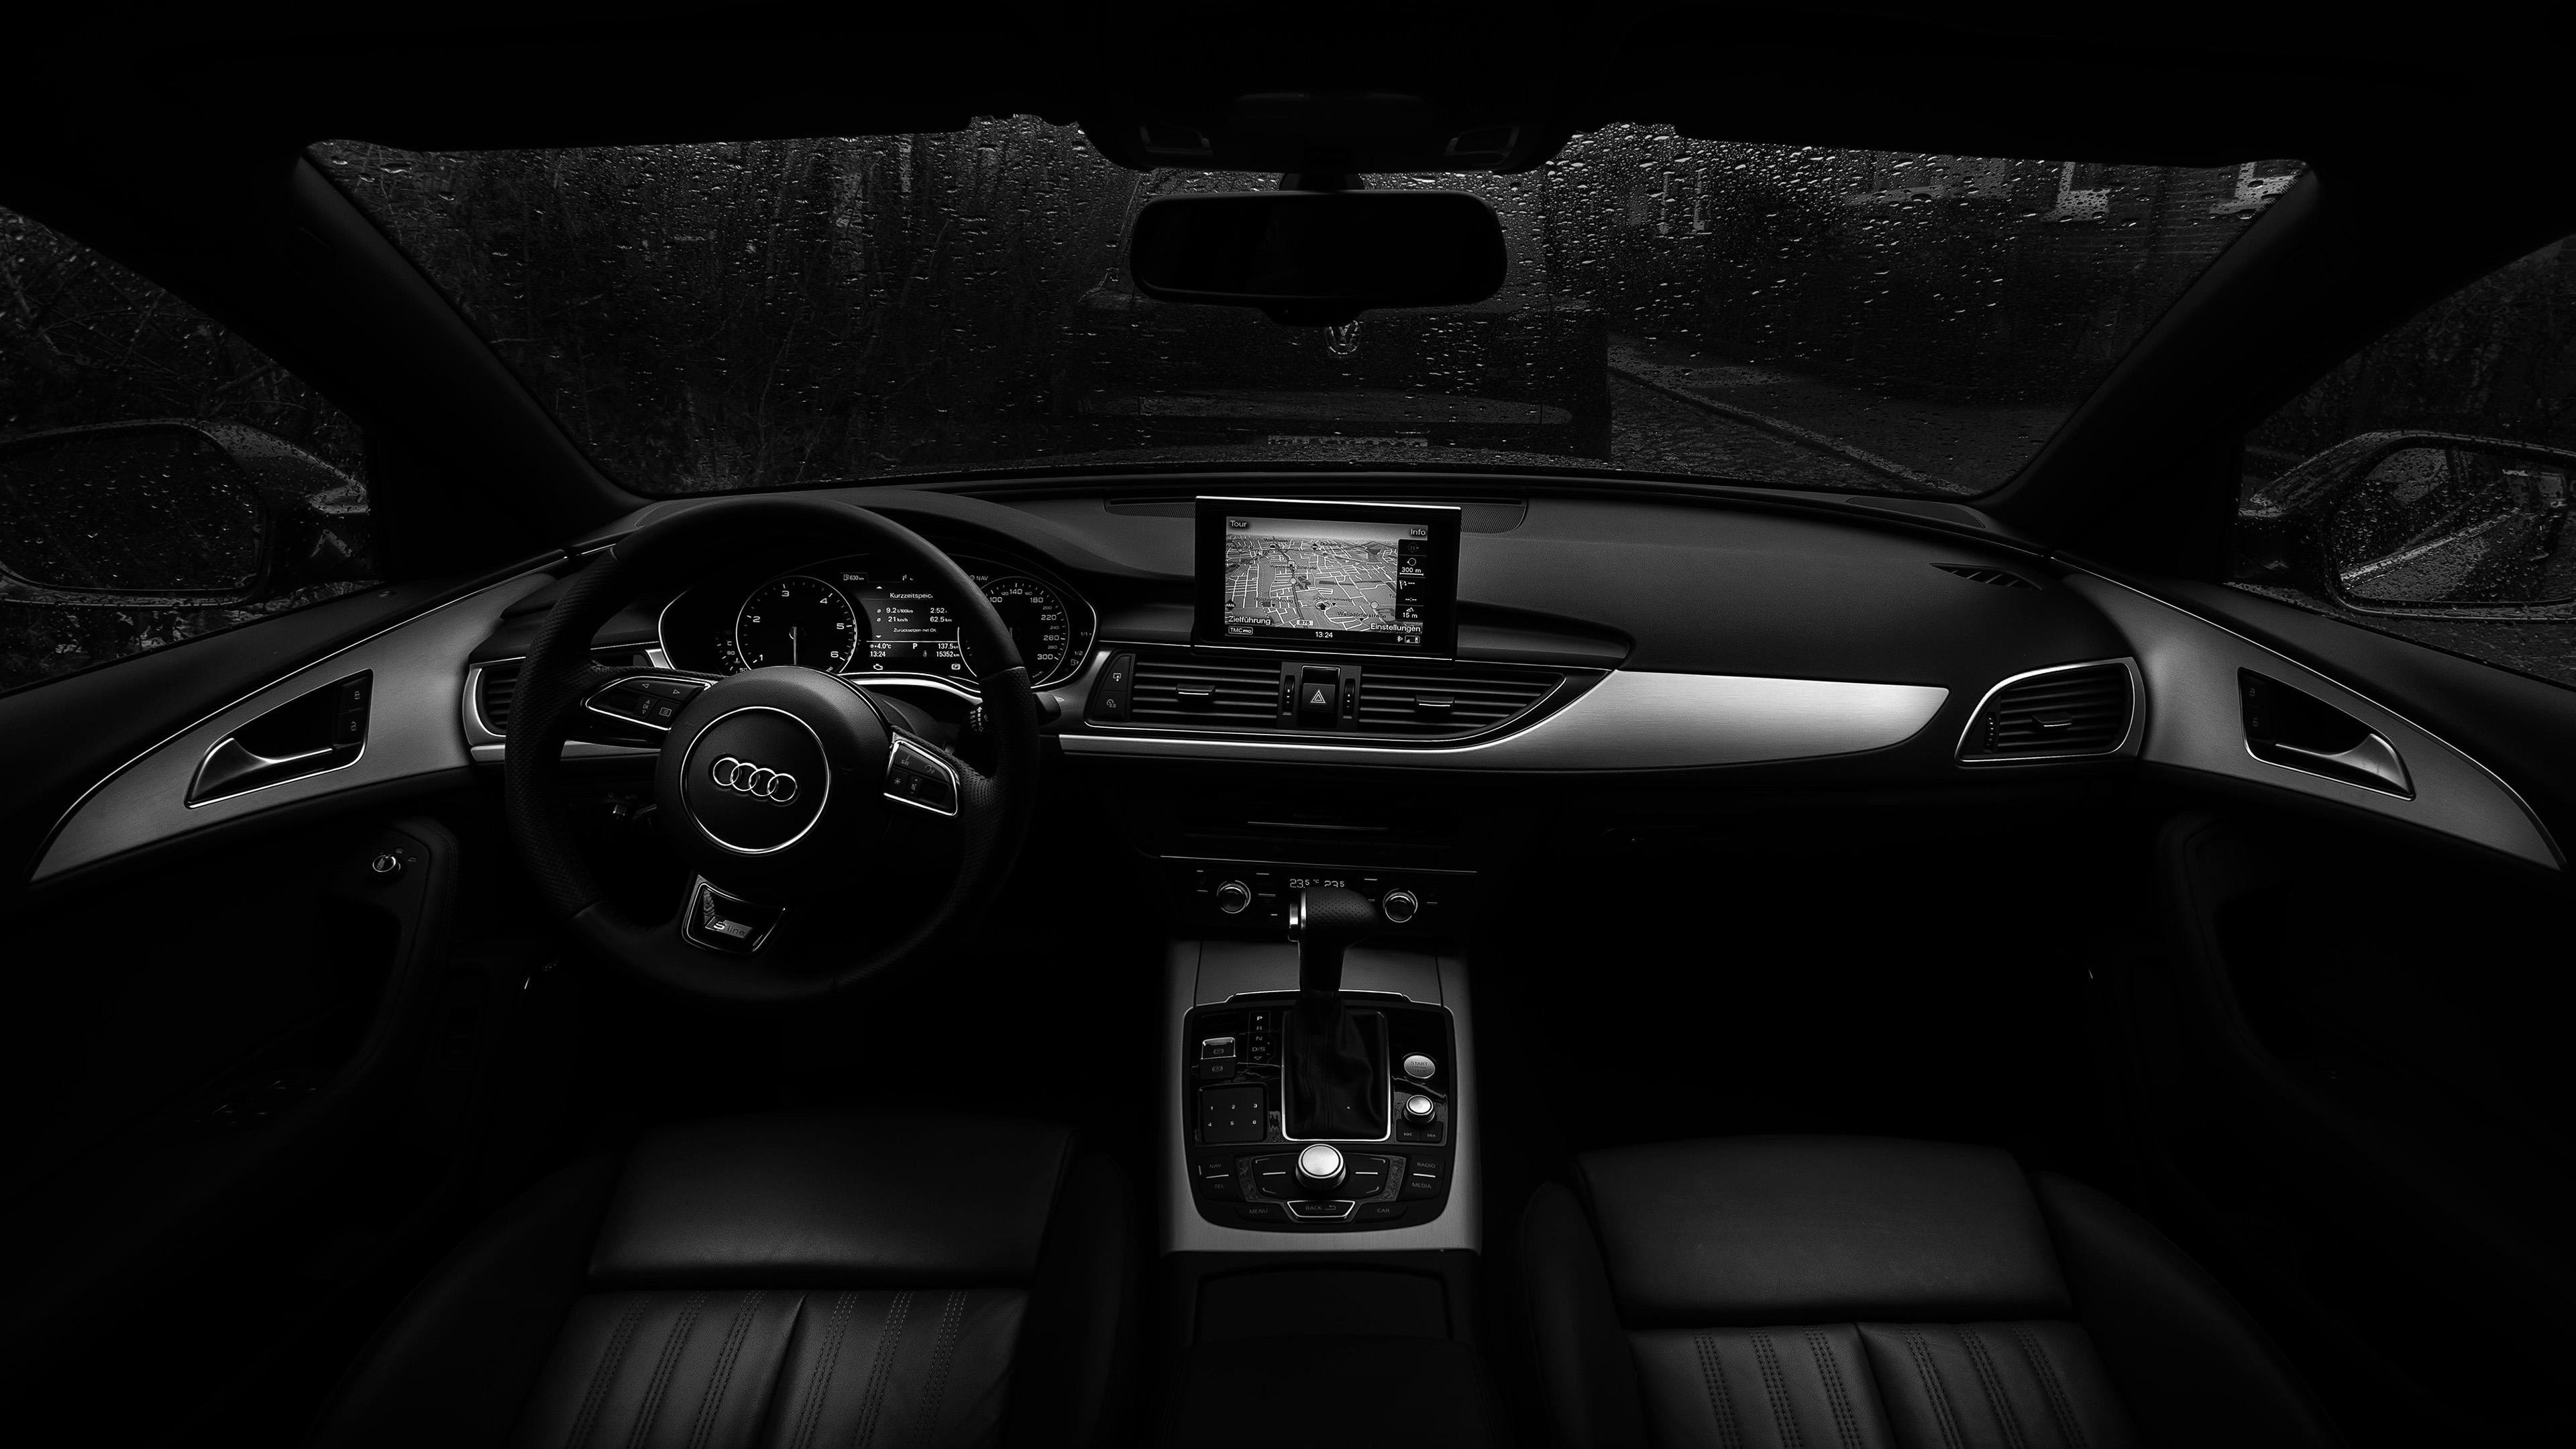 no06-audi-car-interior-dark-bw-wallpaper